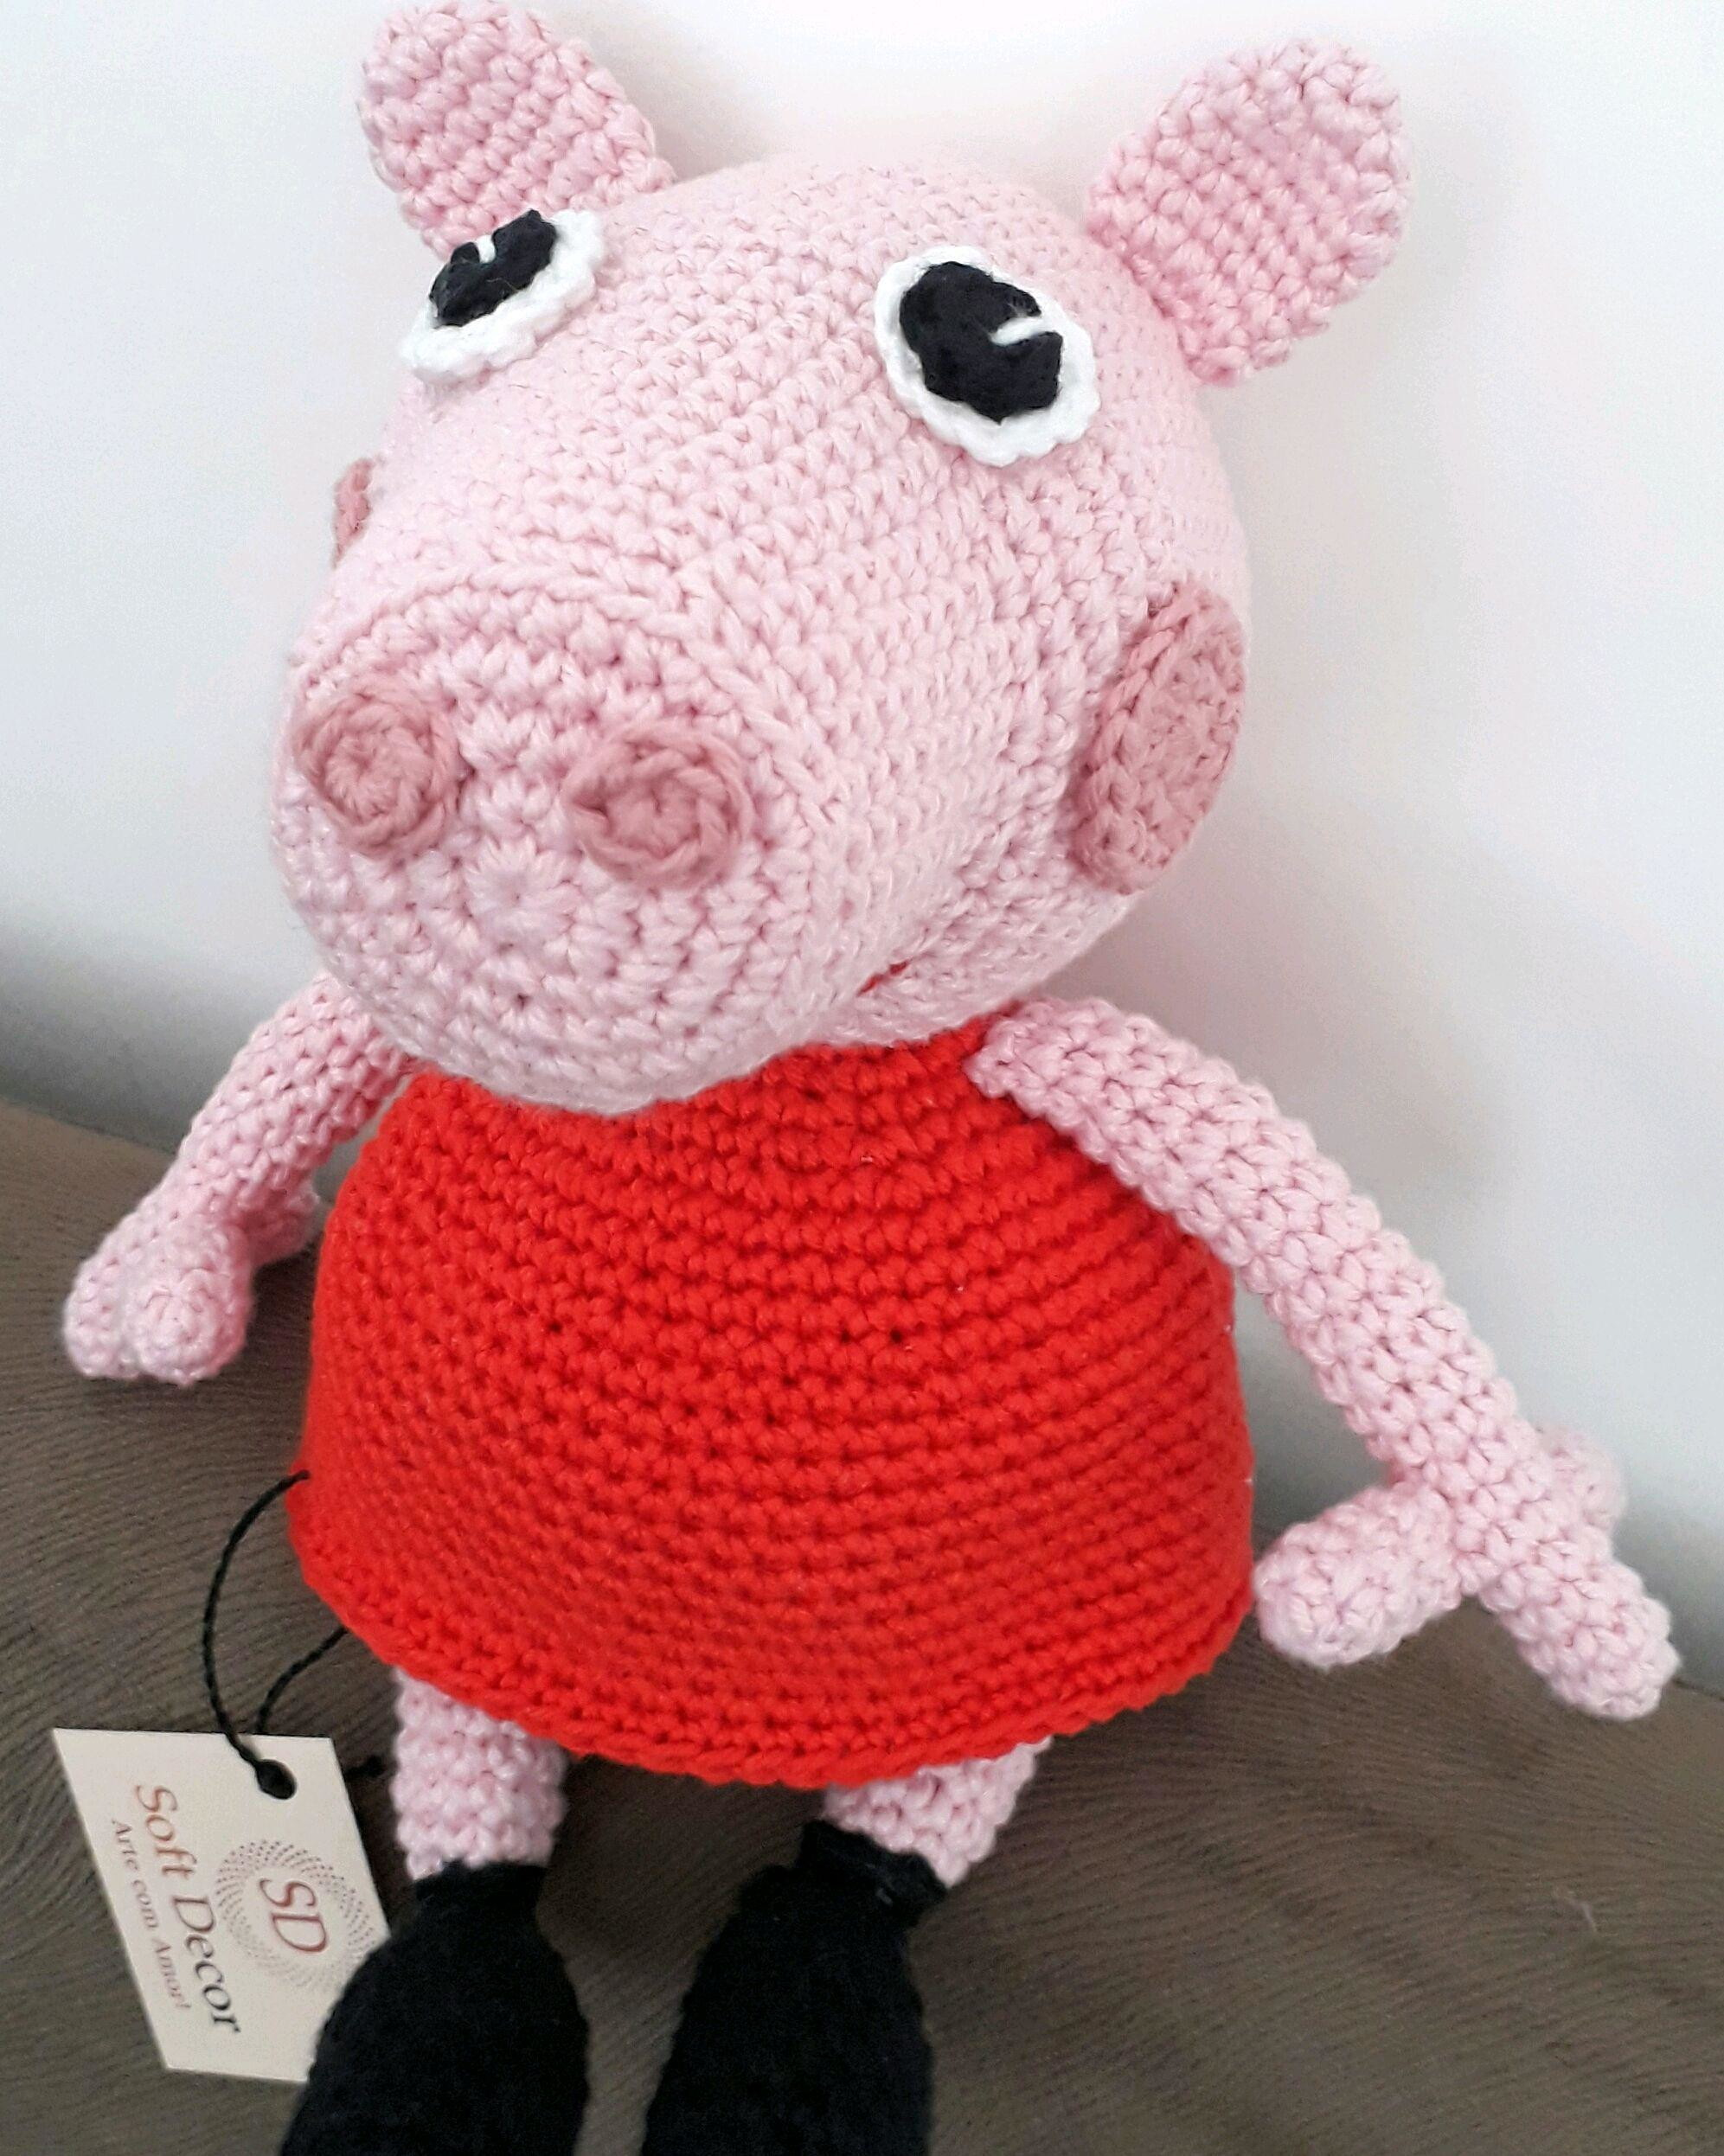 Peppa Pig - free crochet pattern   Crochet pig, Crochet patterns ...   2493x1993